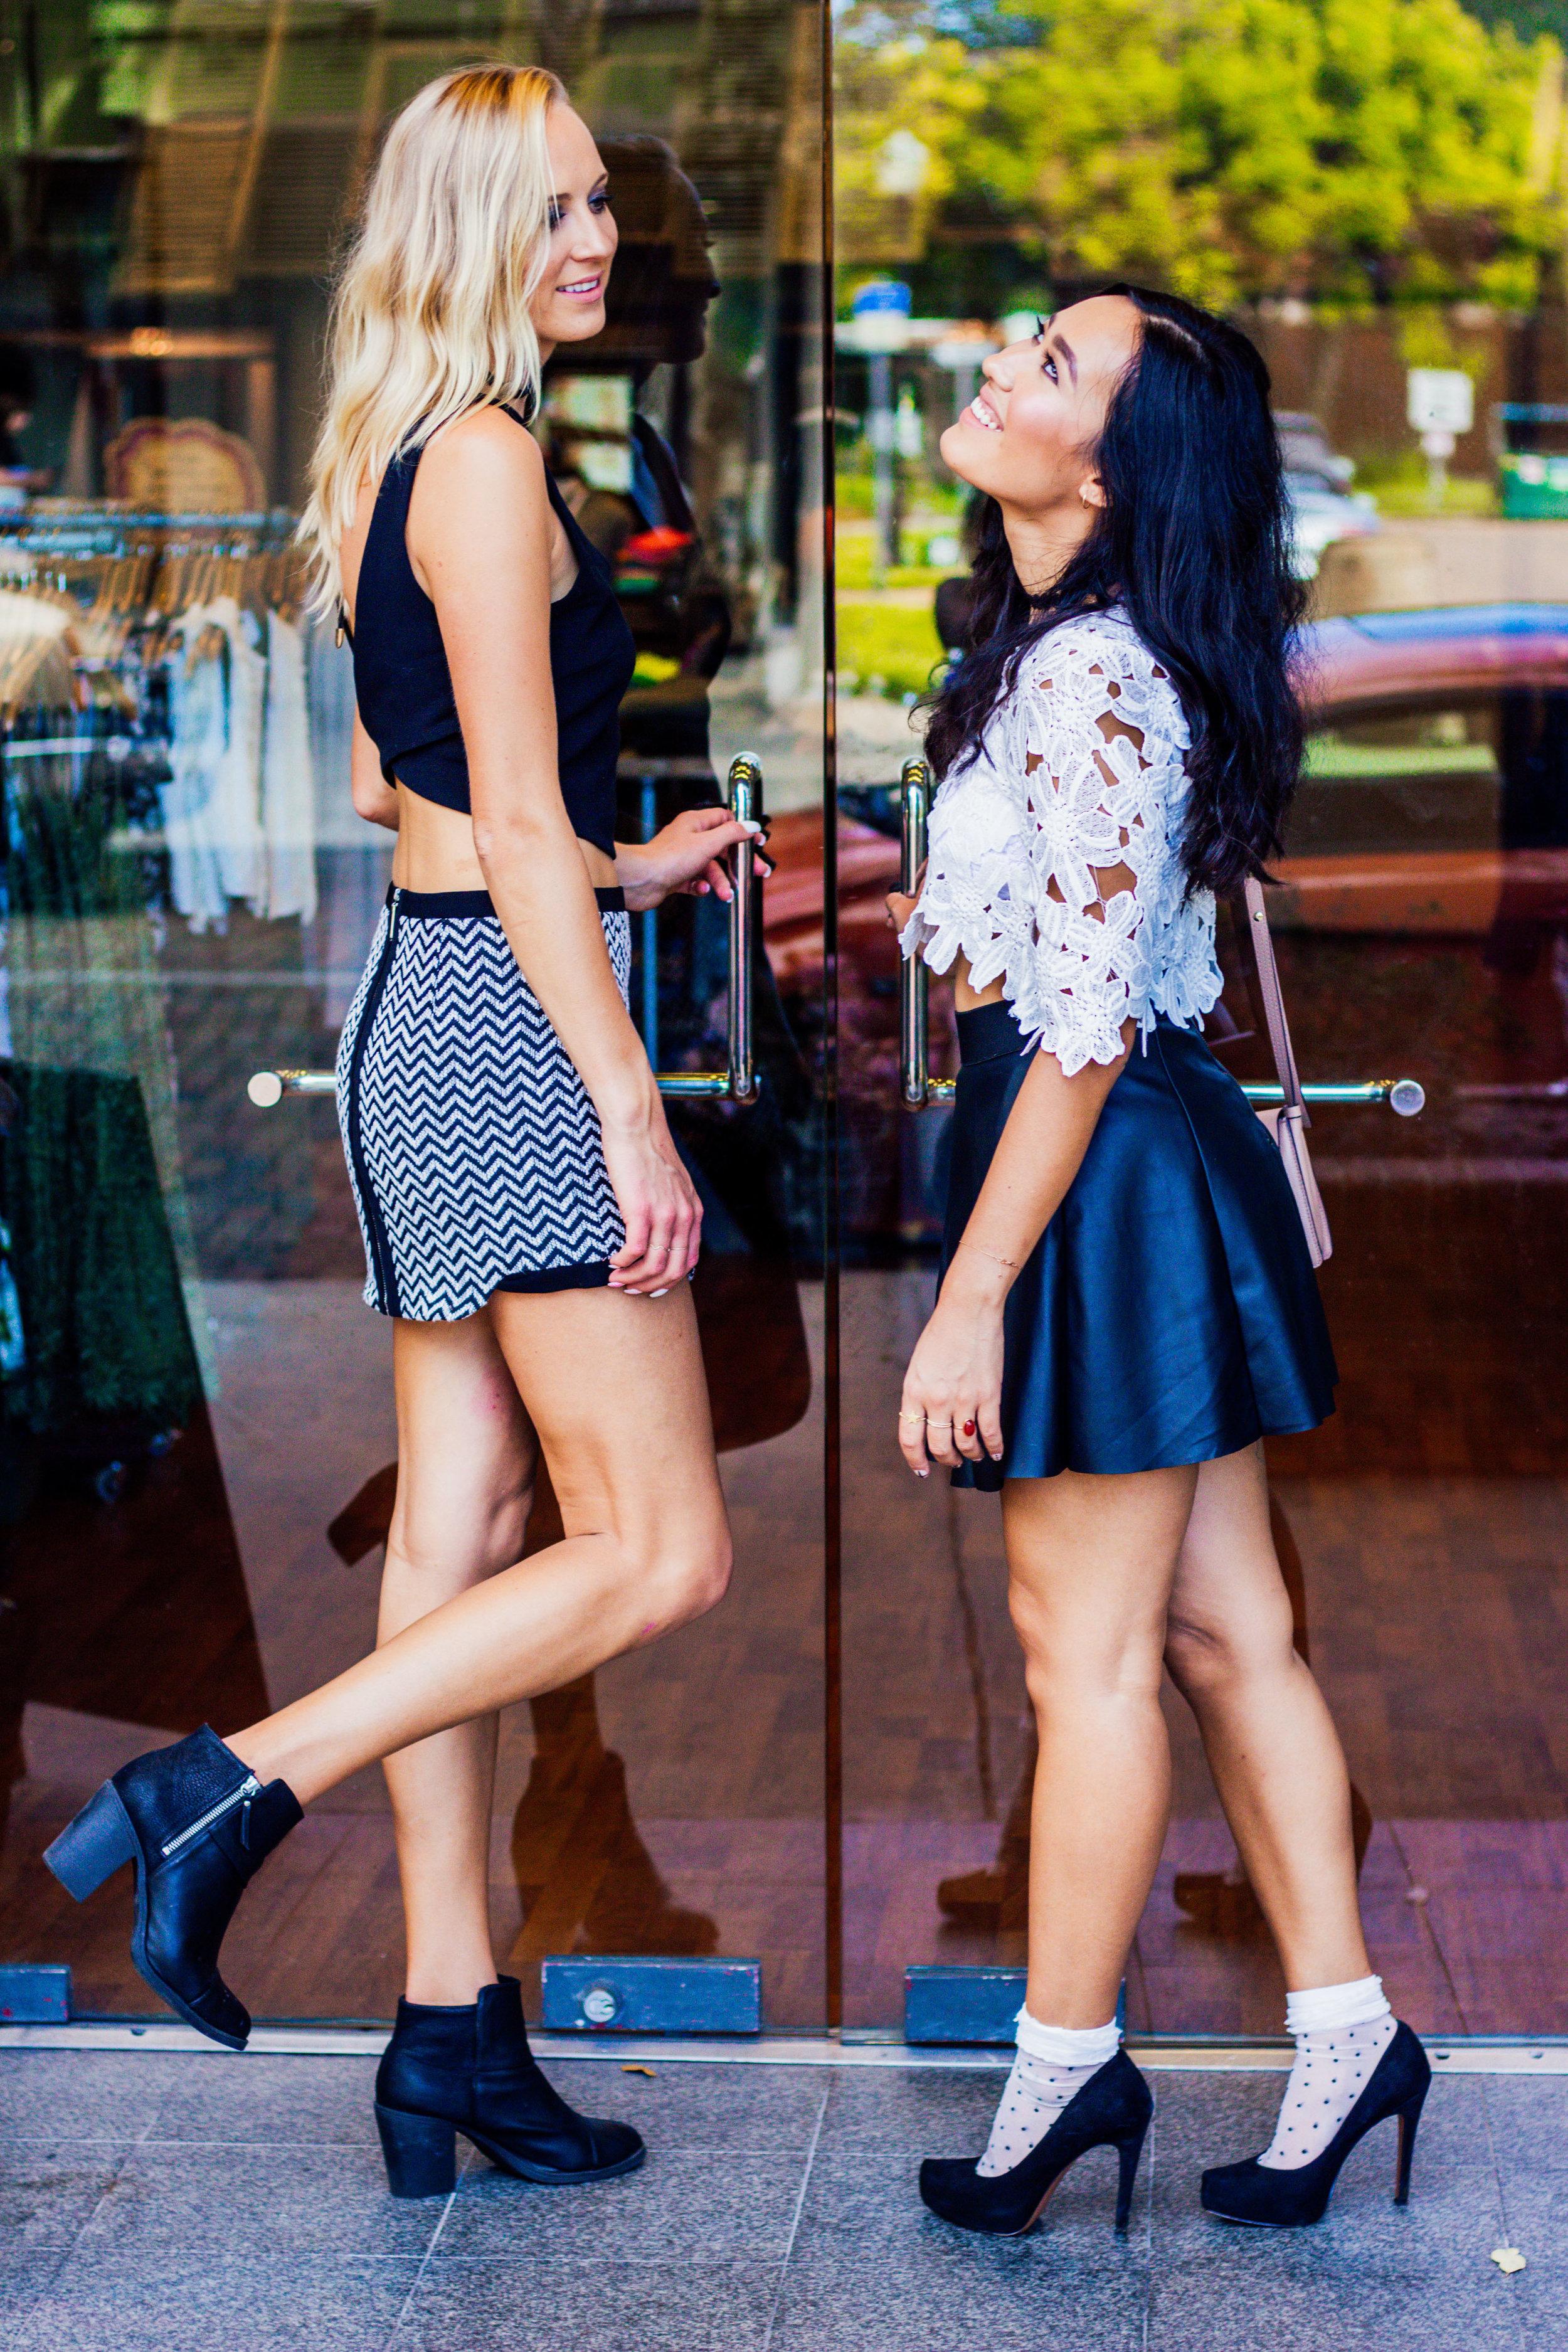 blonde-brunette-best-friends-gossip-girl